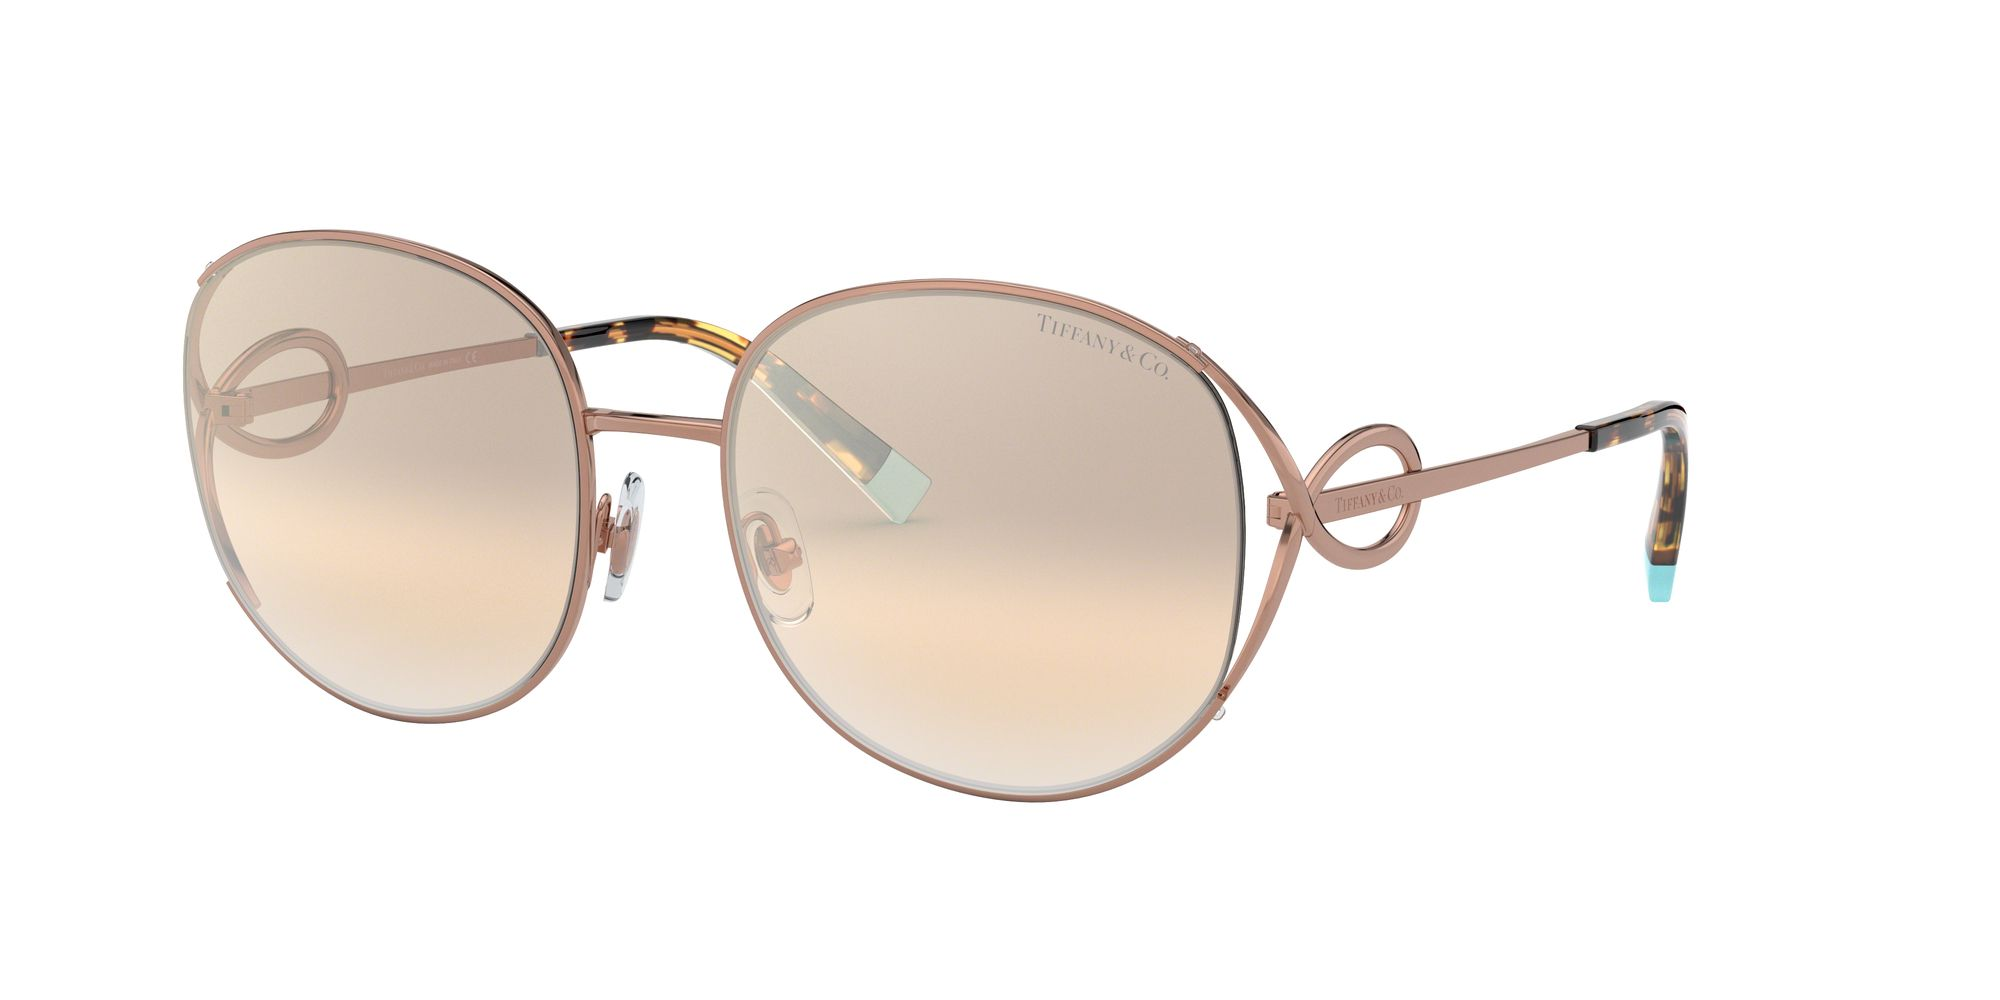 Tiffany & Co Tiffany & Co TF3065 Women's Oval Sunglasses, Dark Rose Gold/Beige Gradient